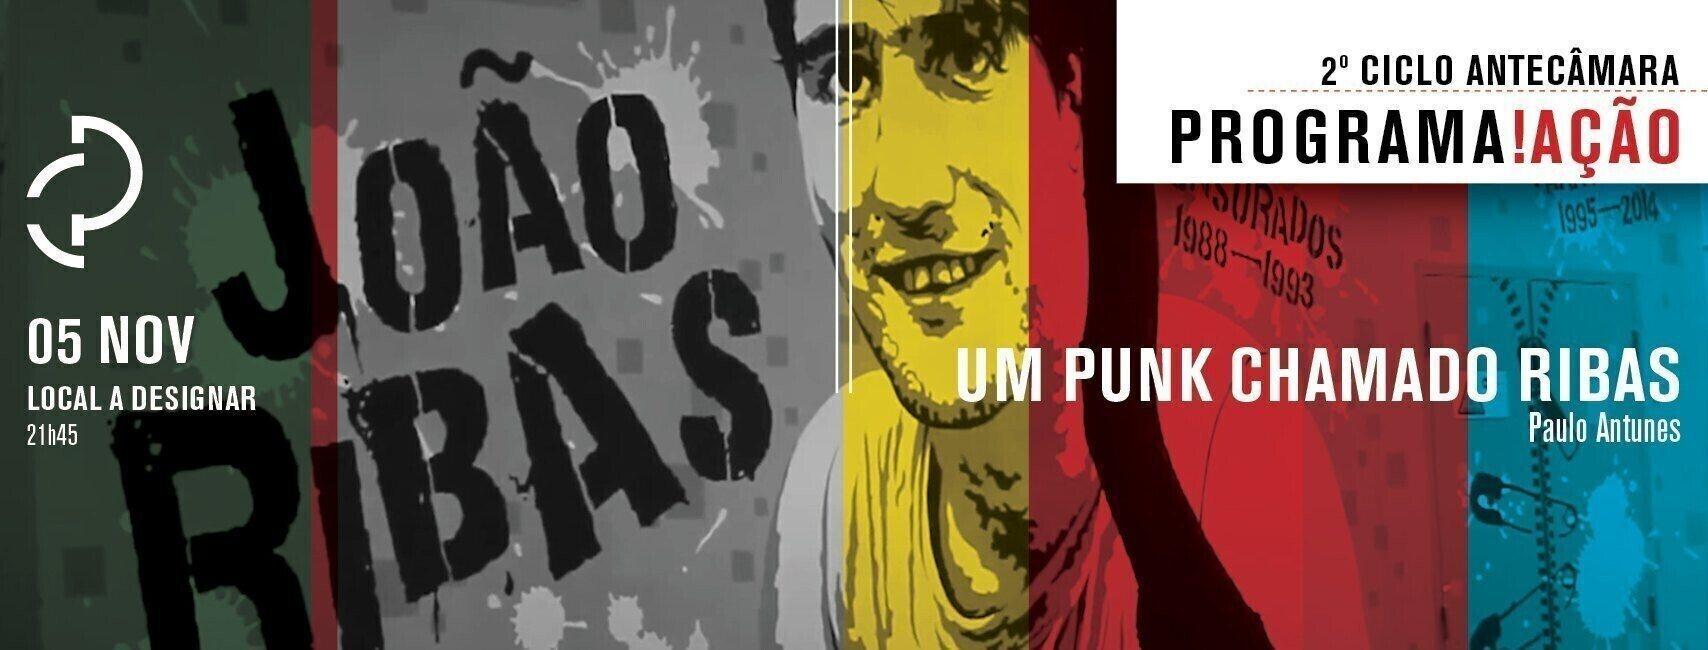 PROGRAMA ACAO BANNER FB15